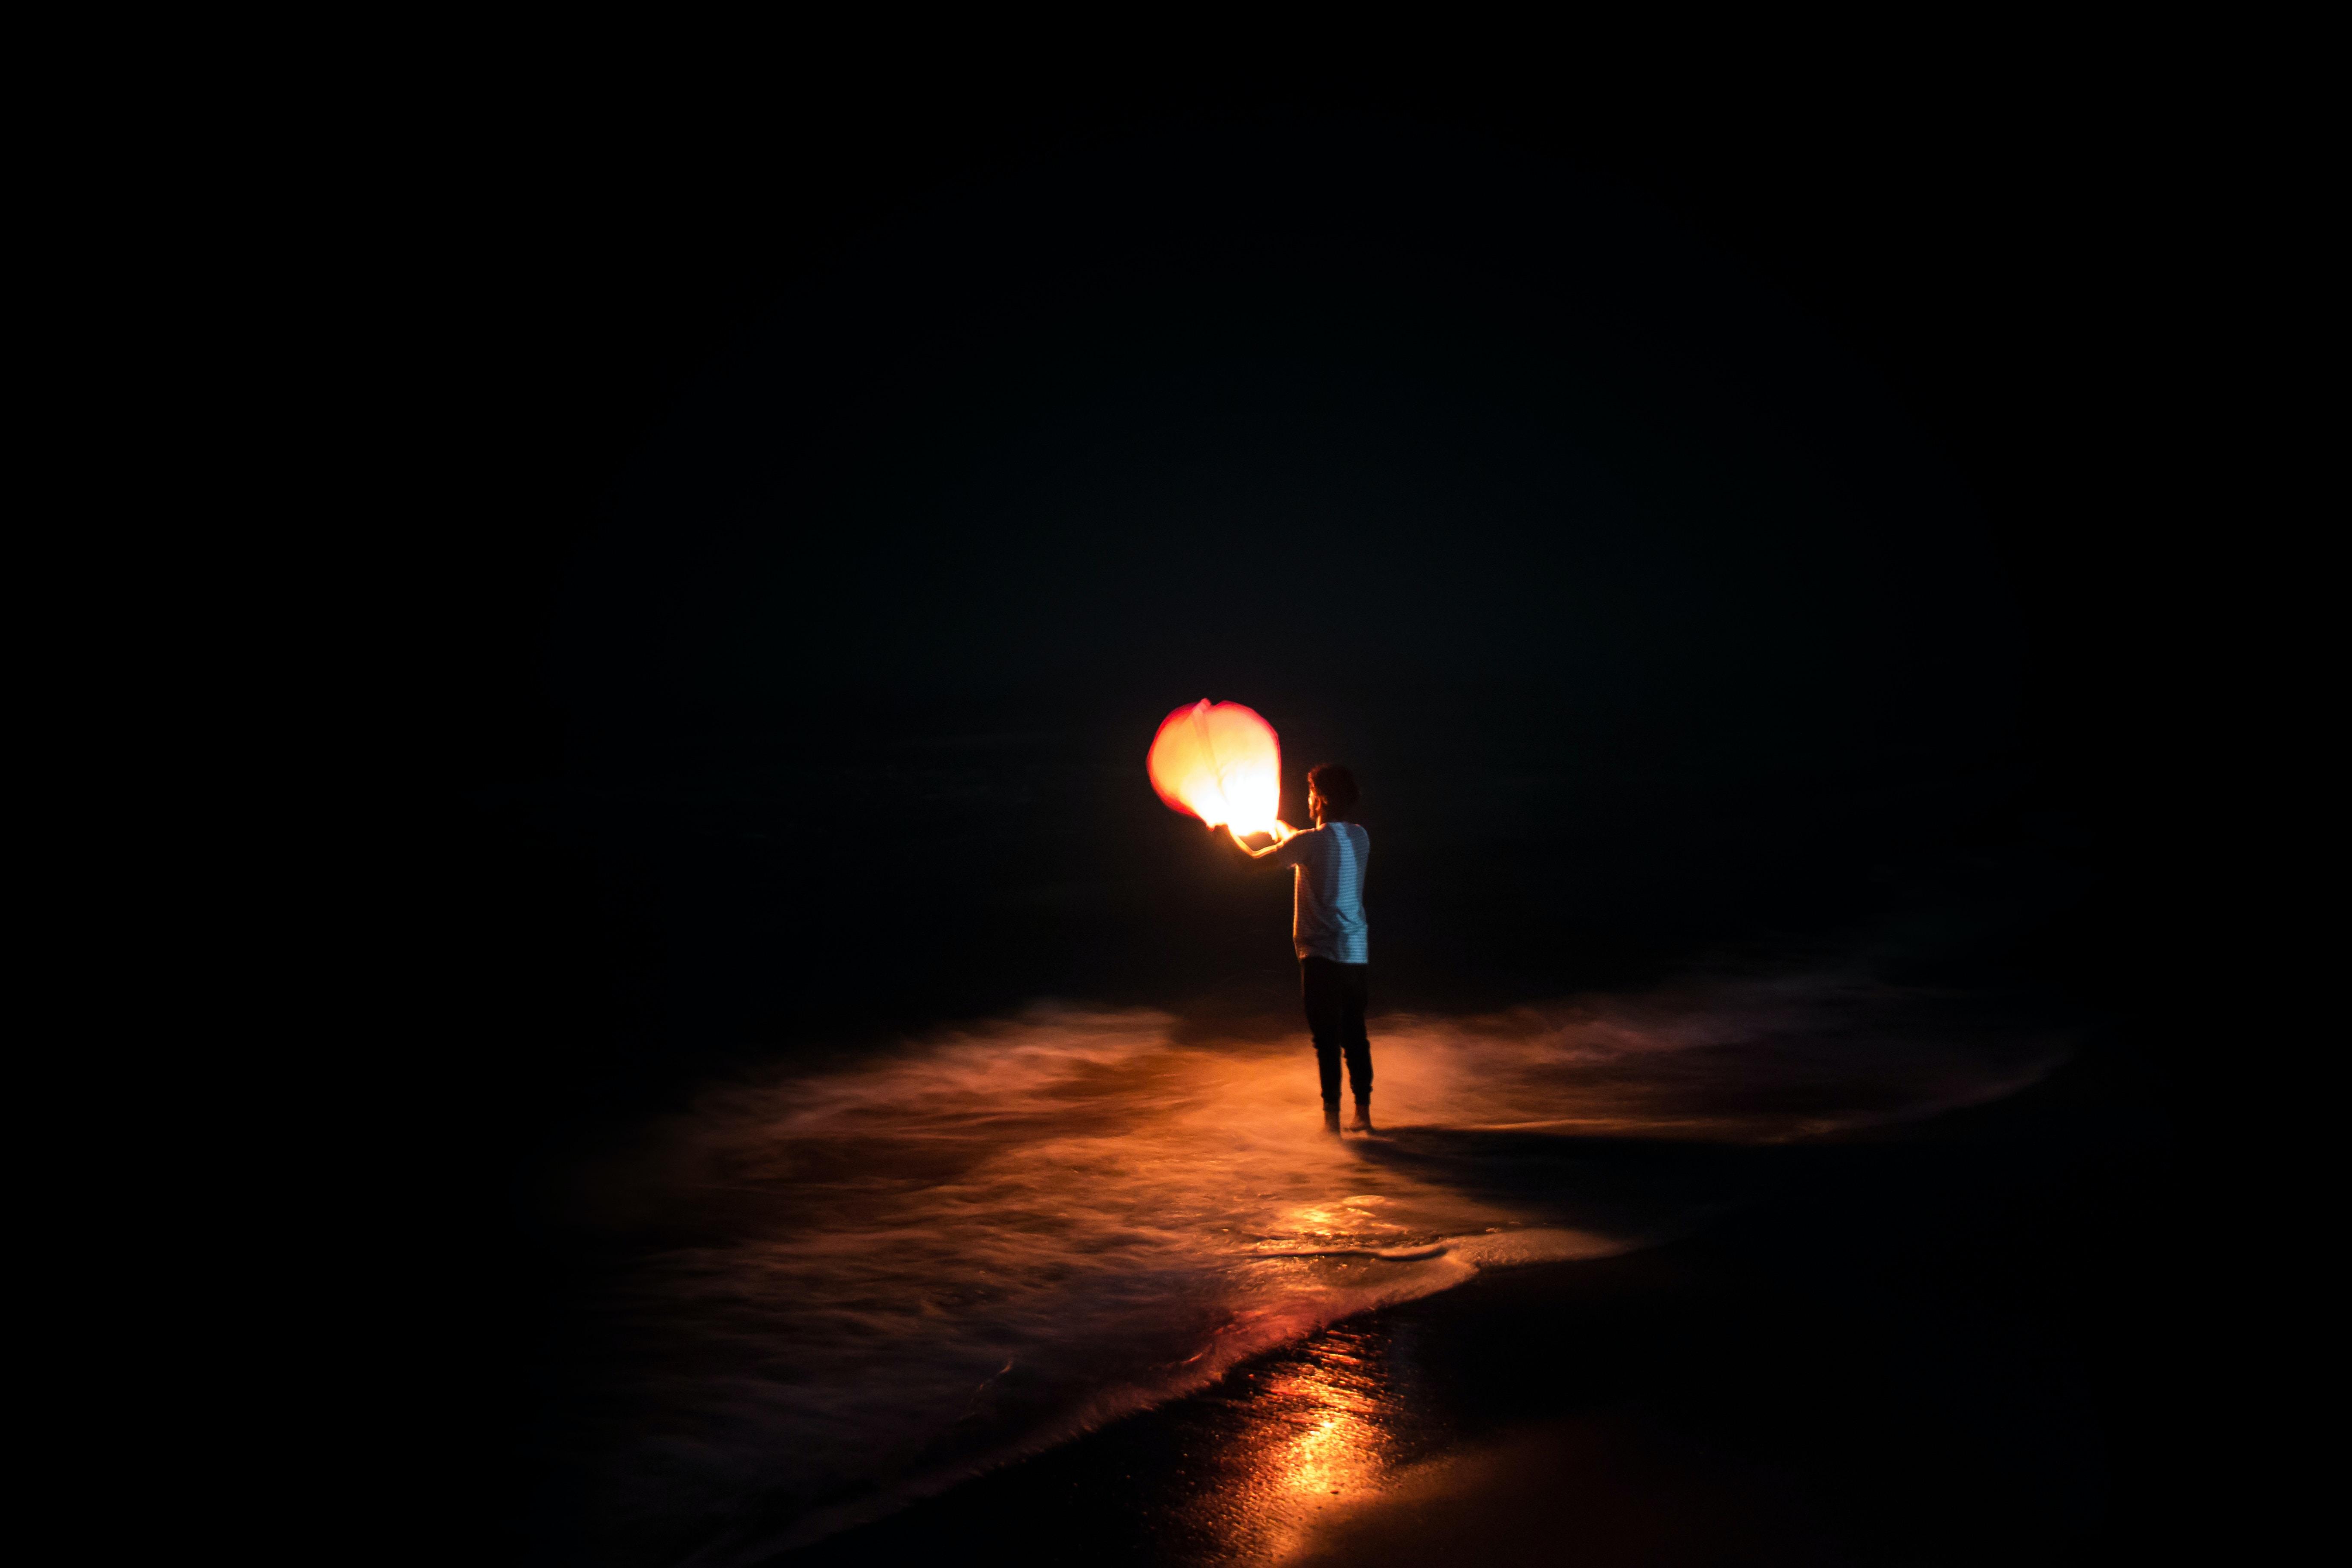 Person holding a lit lantern on a beach in dark at Kannur